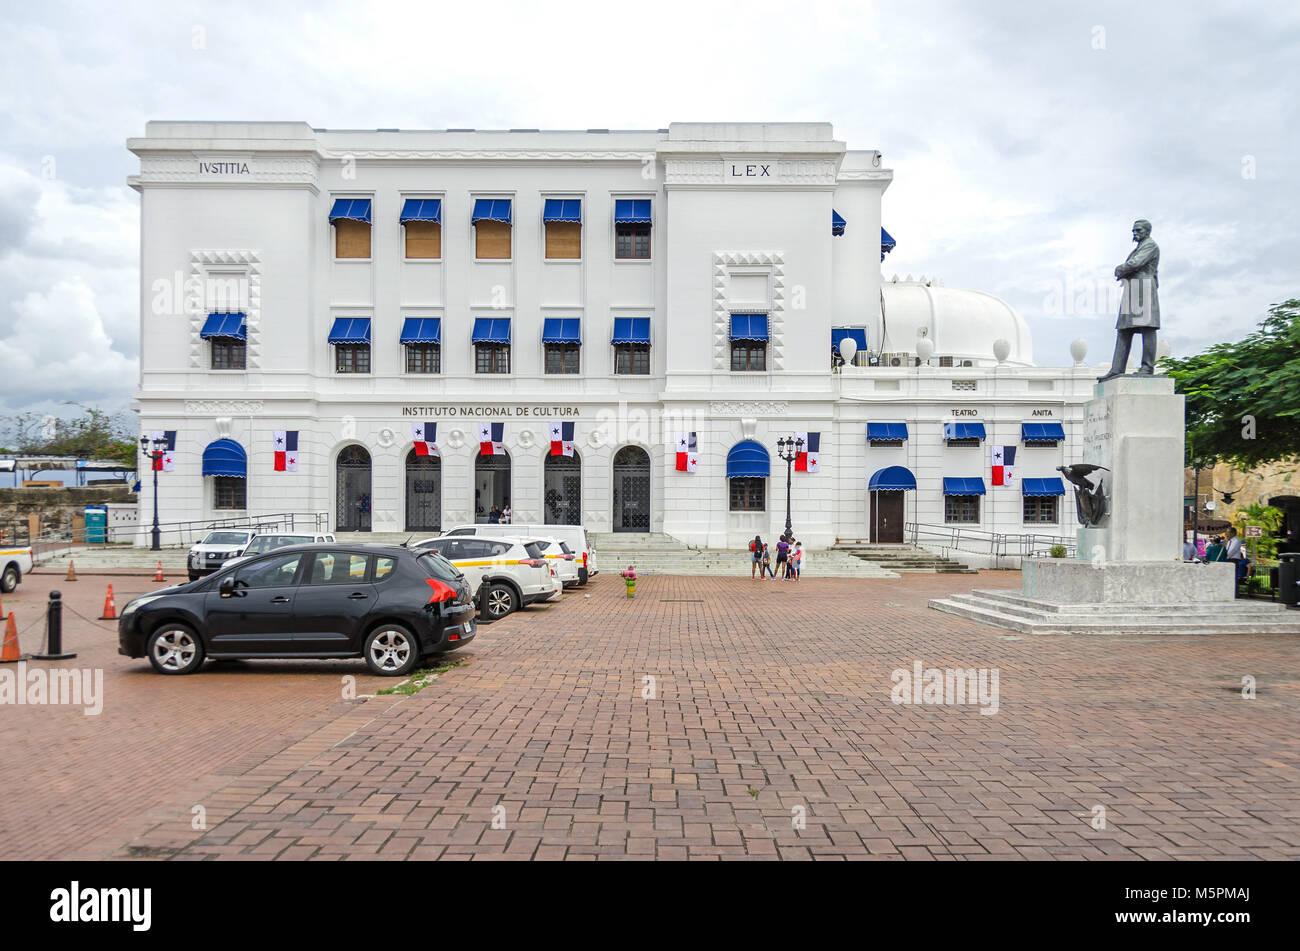 Panama City, Panama - November 3, 2017: National Institute of culture (Instituto National de Cultura) in the historic - Stock Image